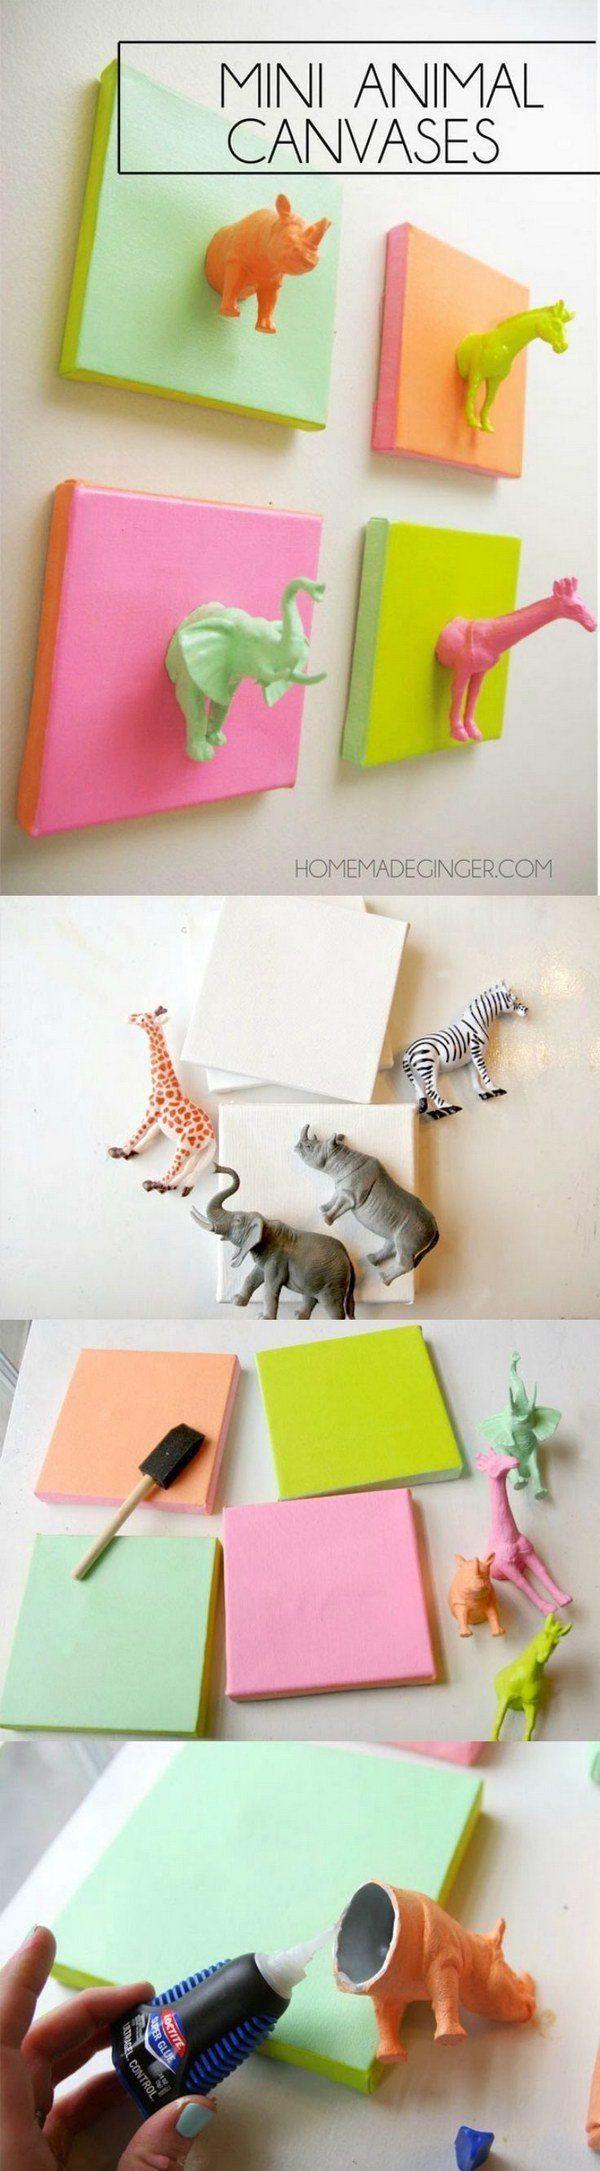 25+ Best Colorful Wall Art Ideas On Pinterest | Animal Art For for Vibrant Wall Art